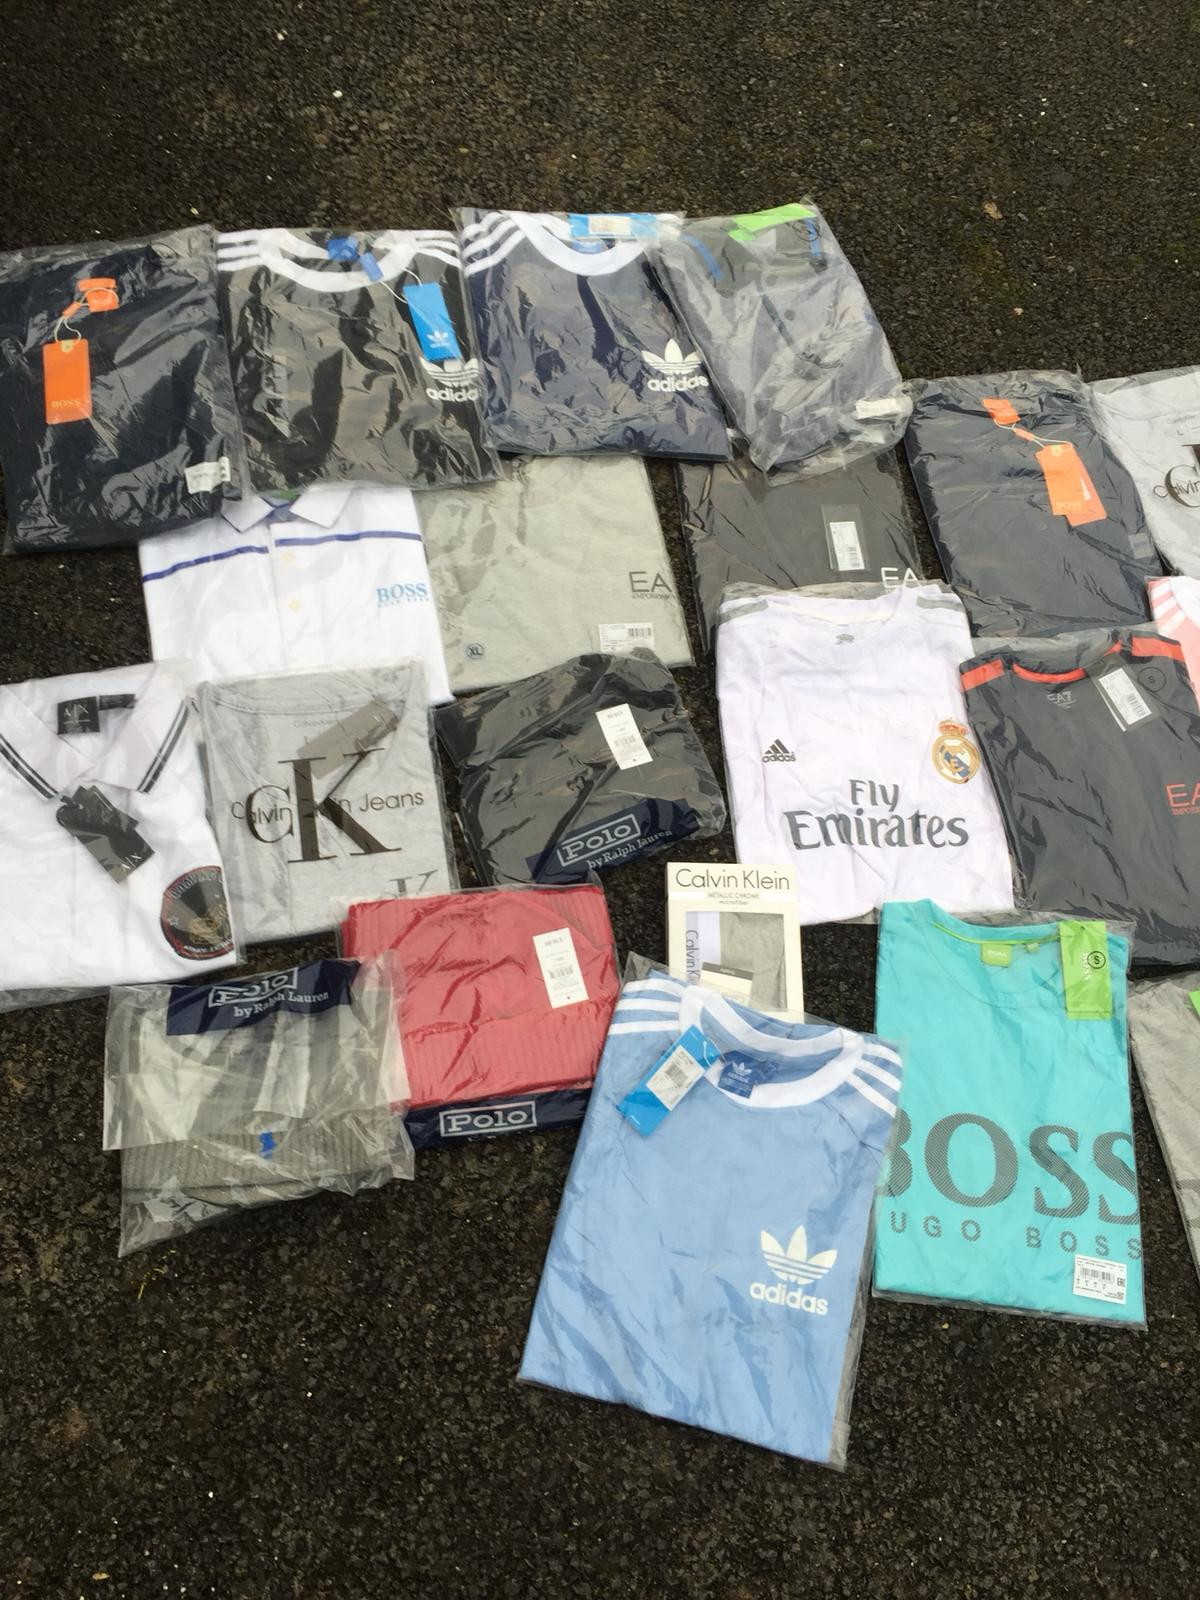 Counterfeit clothing